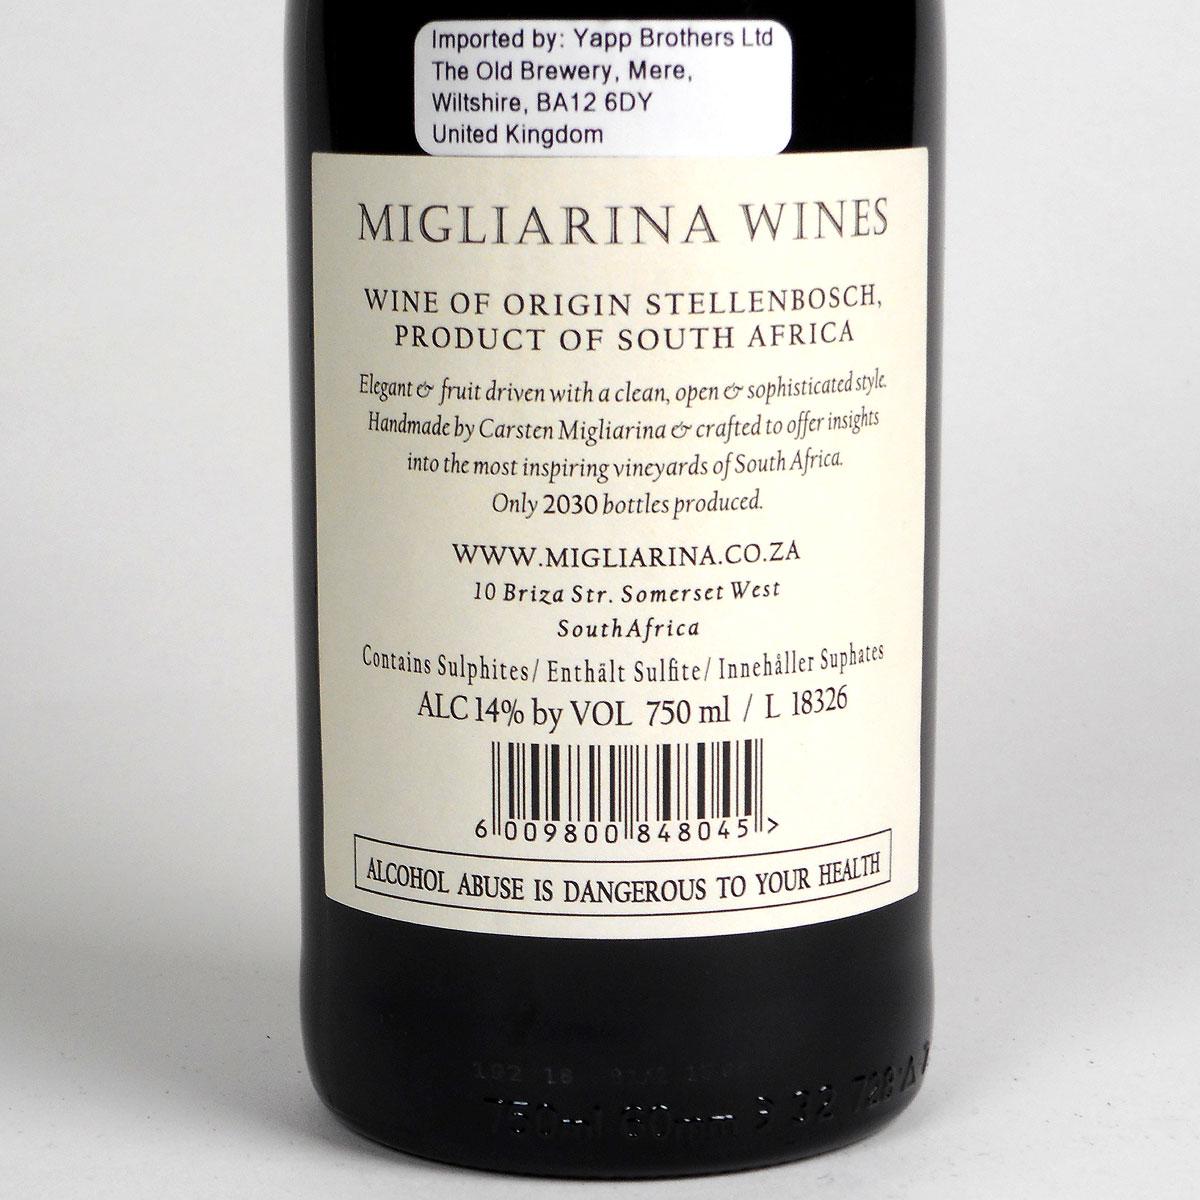 Stellenbosch: Migliarina Syrah 2017 - Bottle Rear Label